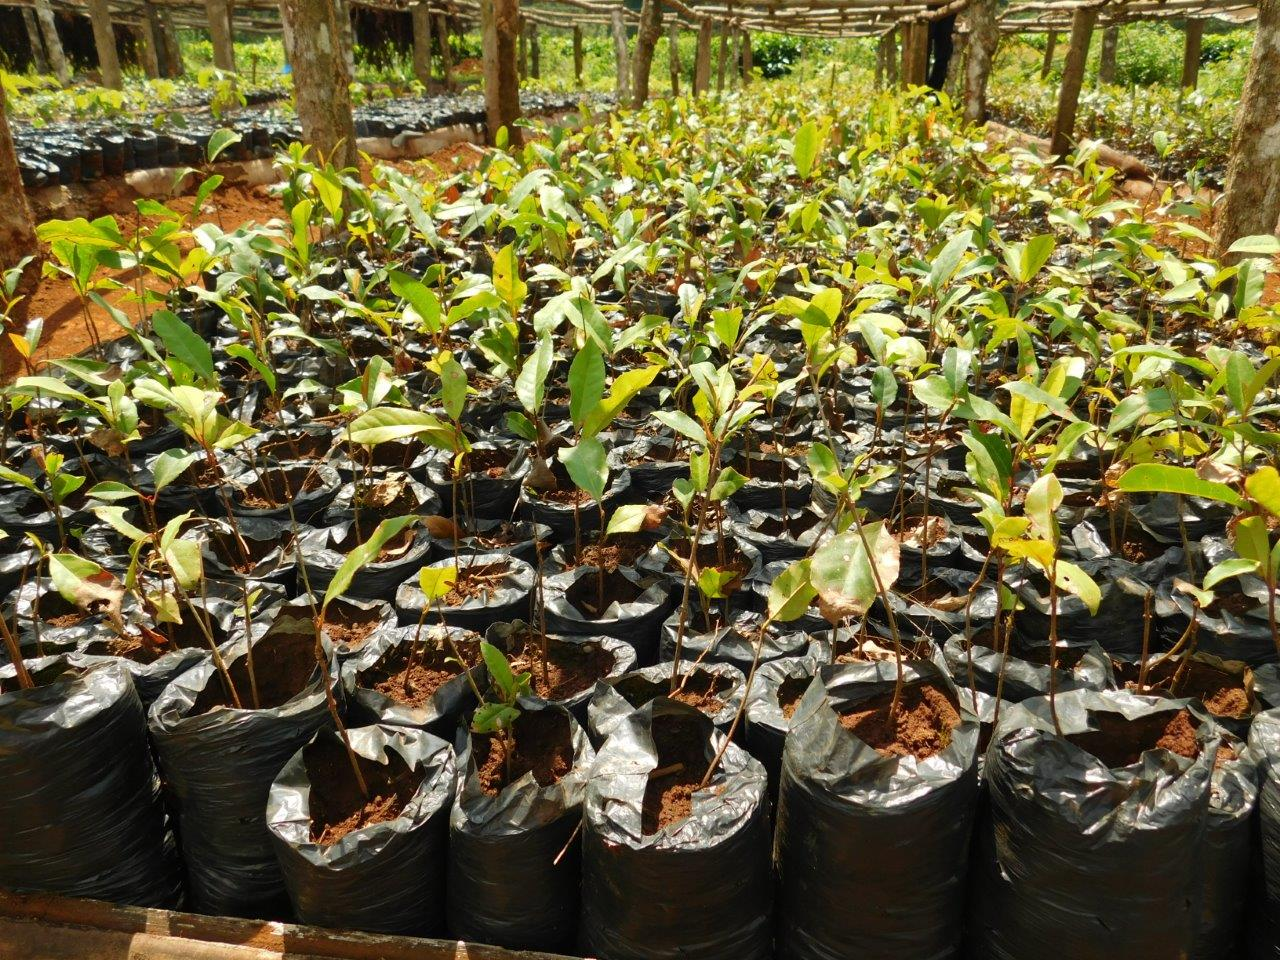 ITF Copy of Syzygium guineense seedlings at Kagaari Munyange tree nursery 1